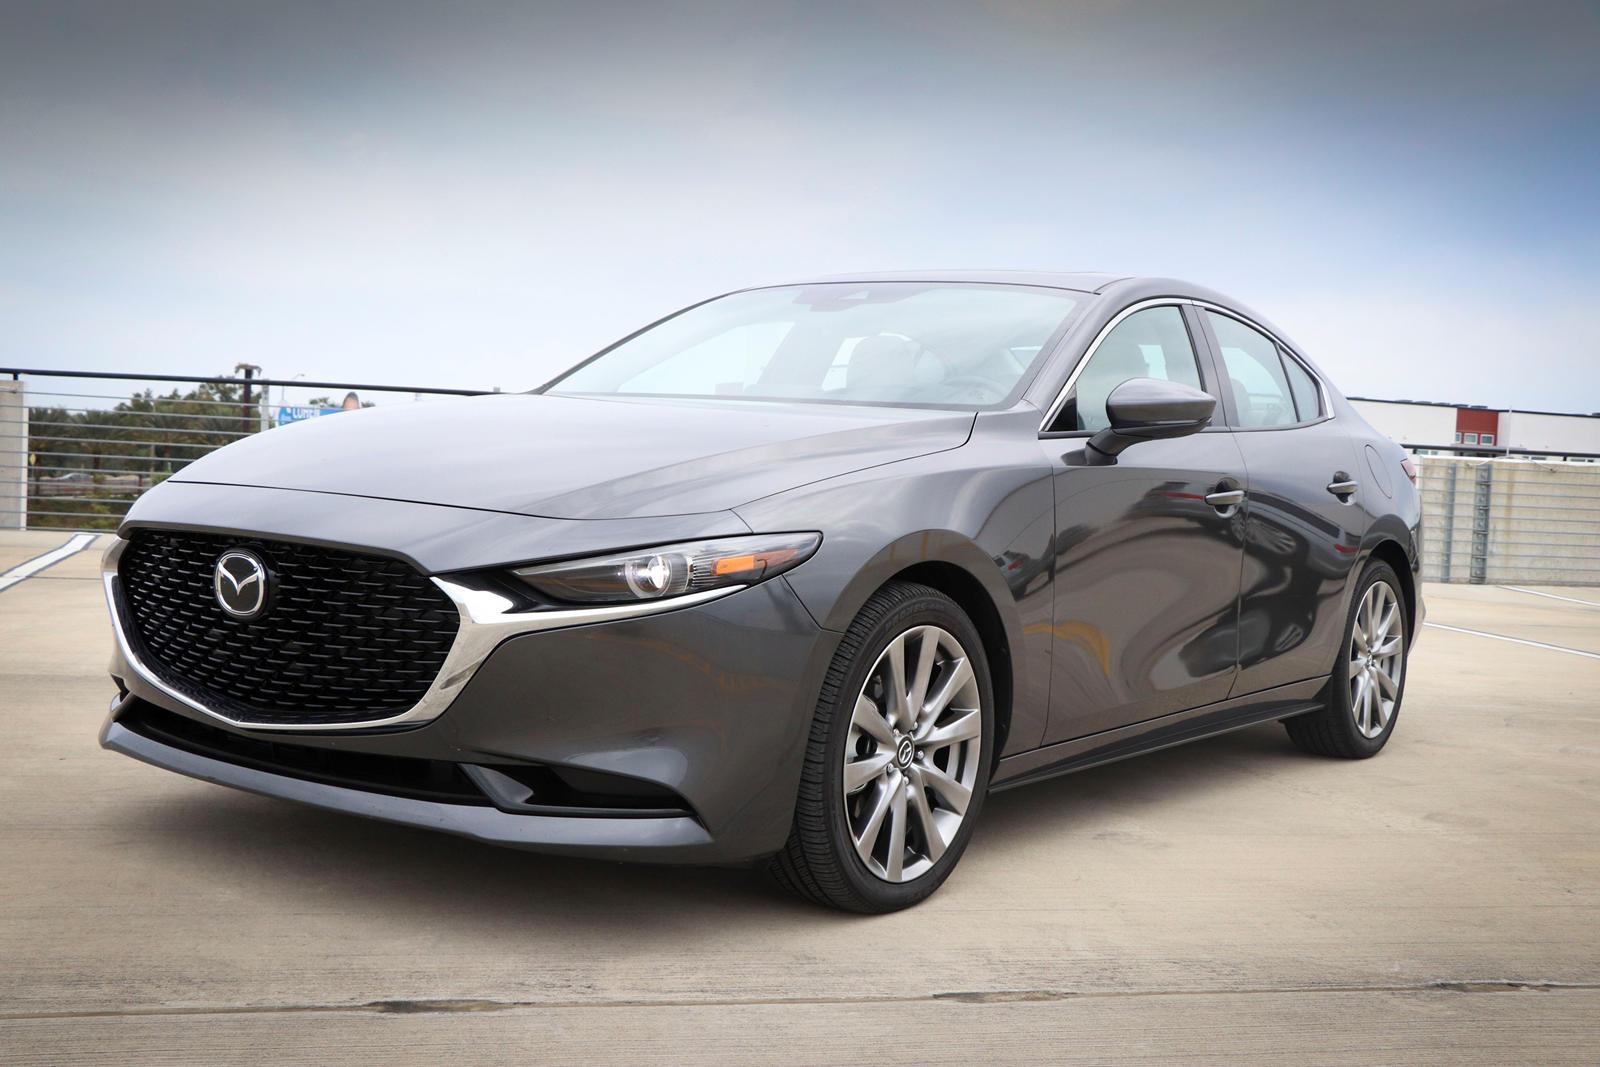 Kelebihan Kekurangan Mazda 2020 Murah Berkualitas